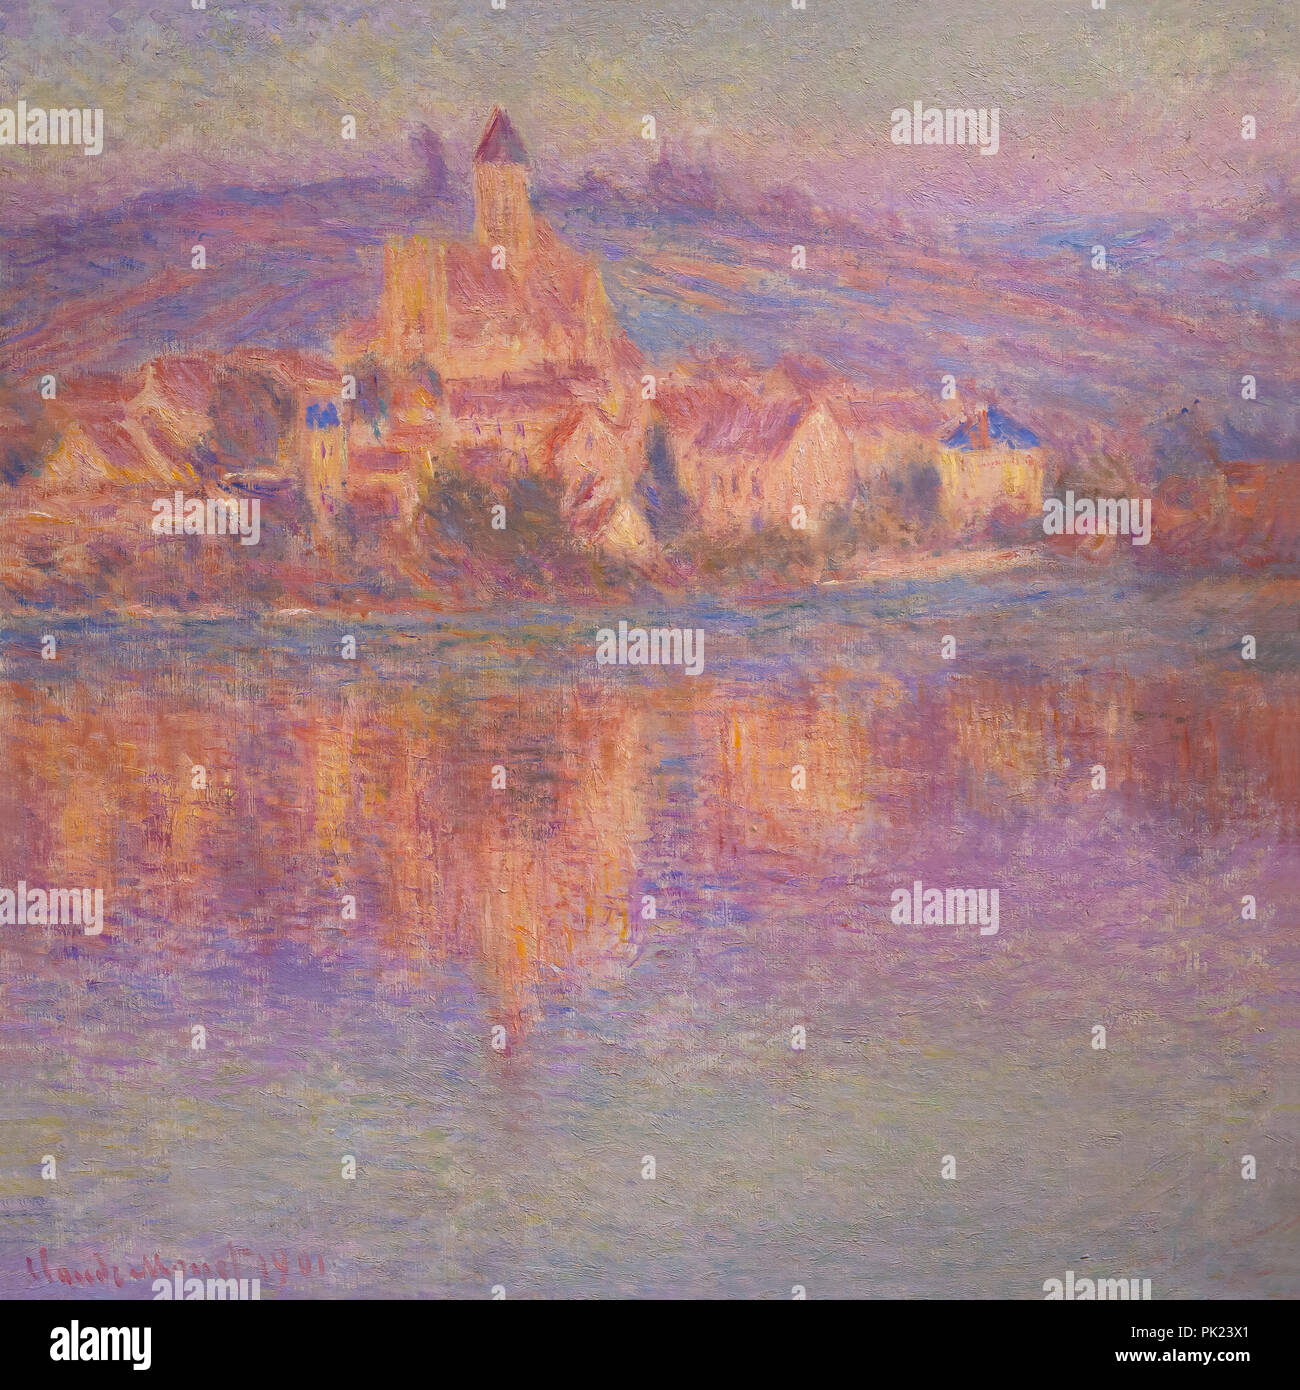 Vetheuil, Claude Monet, 1901, Art Institute of Chicago, Chicago, Illinois, USA, North America, - Stock Image